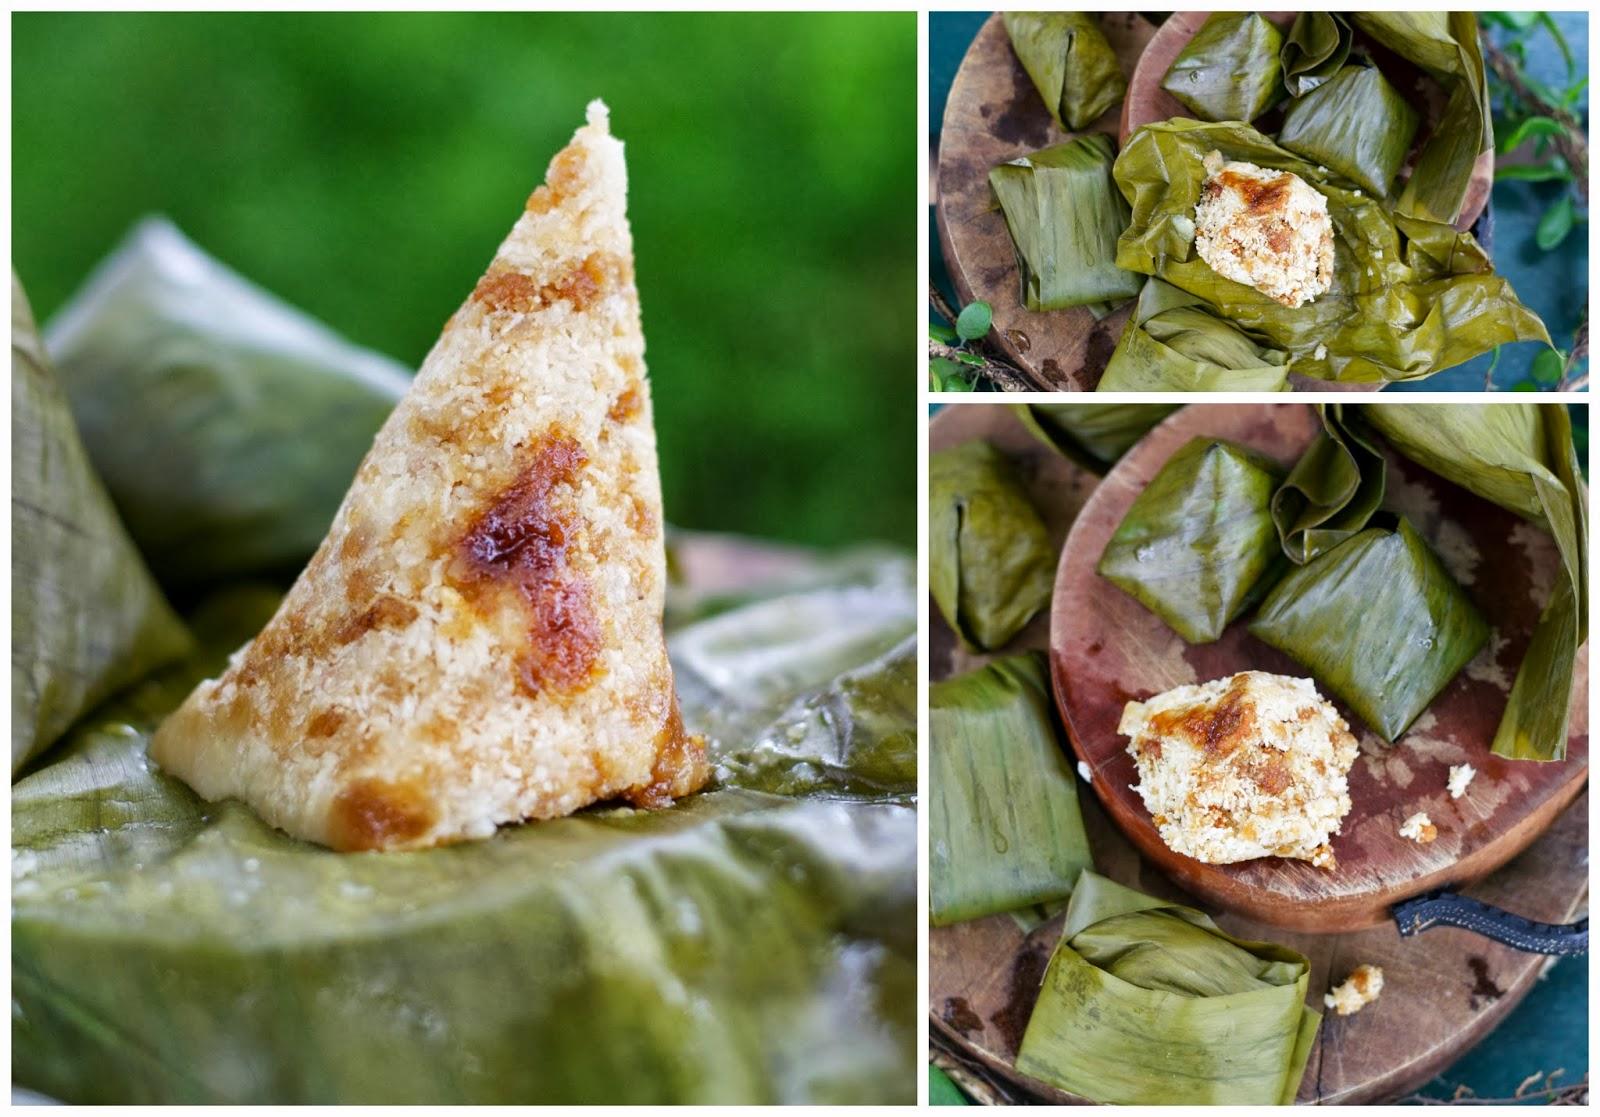 10 Kuliner Tanah Batak yang Bikin Ketagihan, Enaknya Gak Abis-abis!